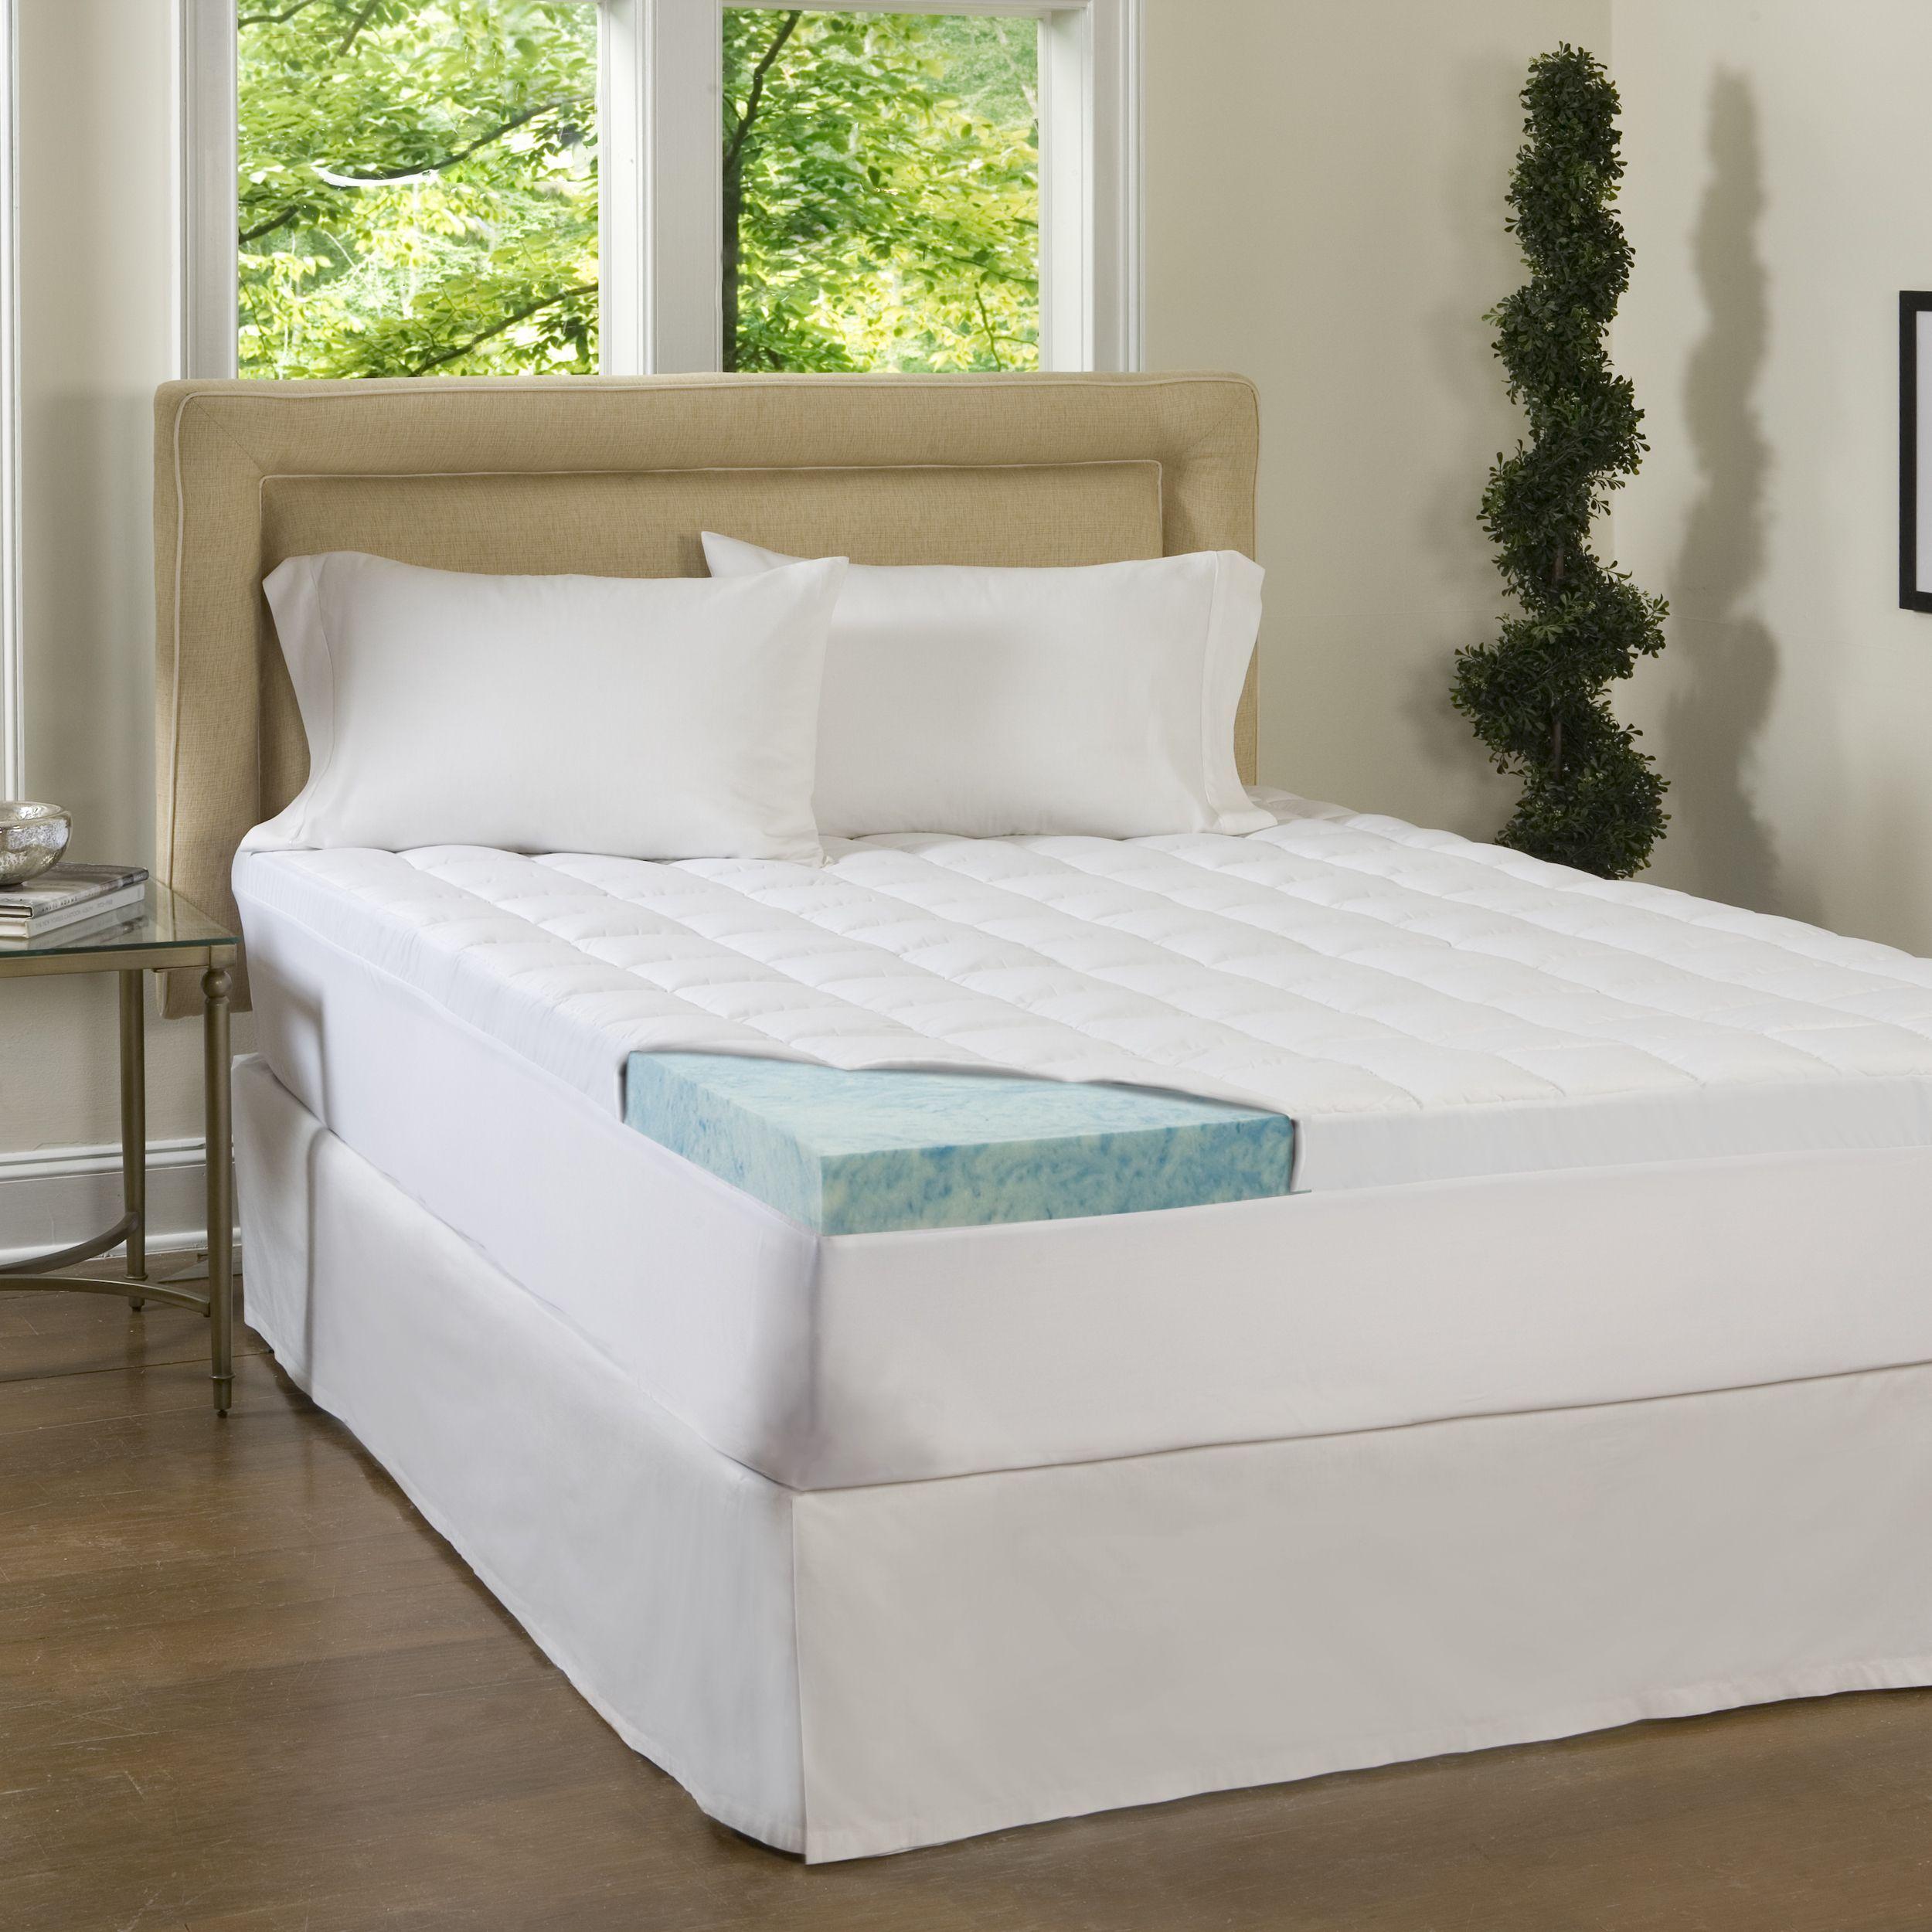 Comforpedic Loft From Beautyrest 2 Inch Supreme Gel Memory Foam